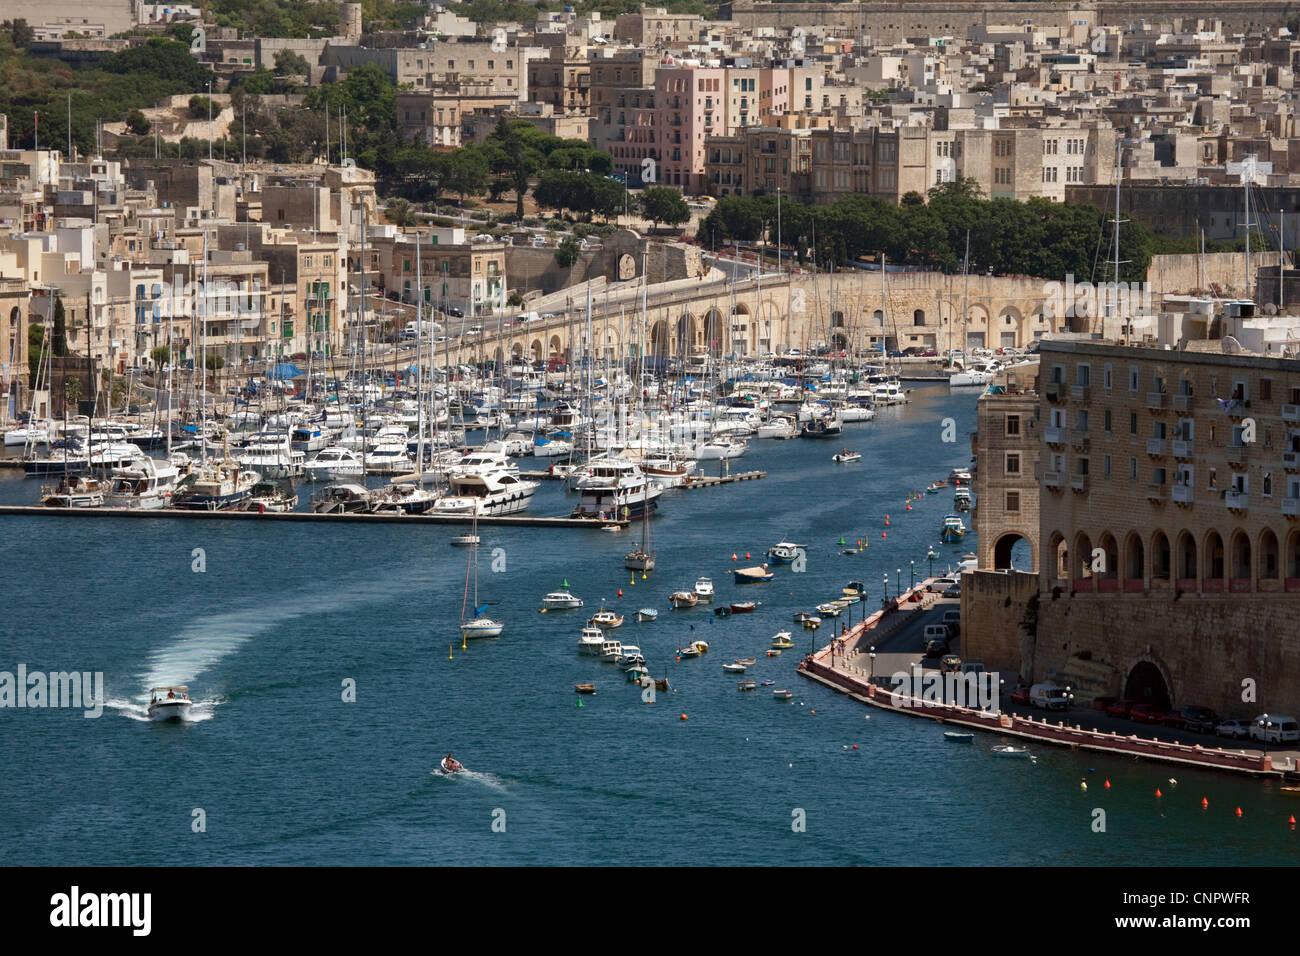 A view of the Three Cities marina from the Upper Barrakka gardens, Valletta, Malta, Europe - Stock Image